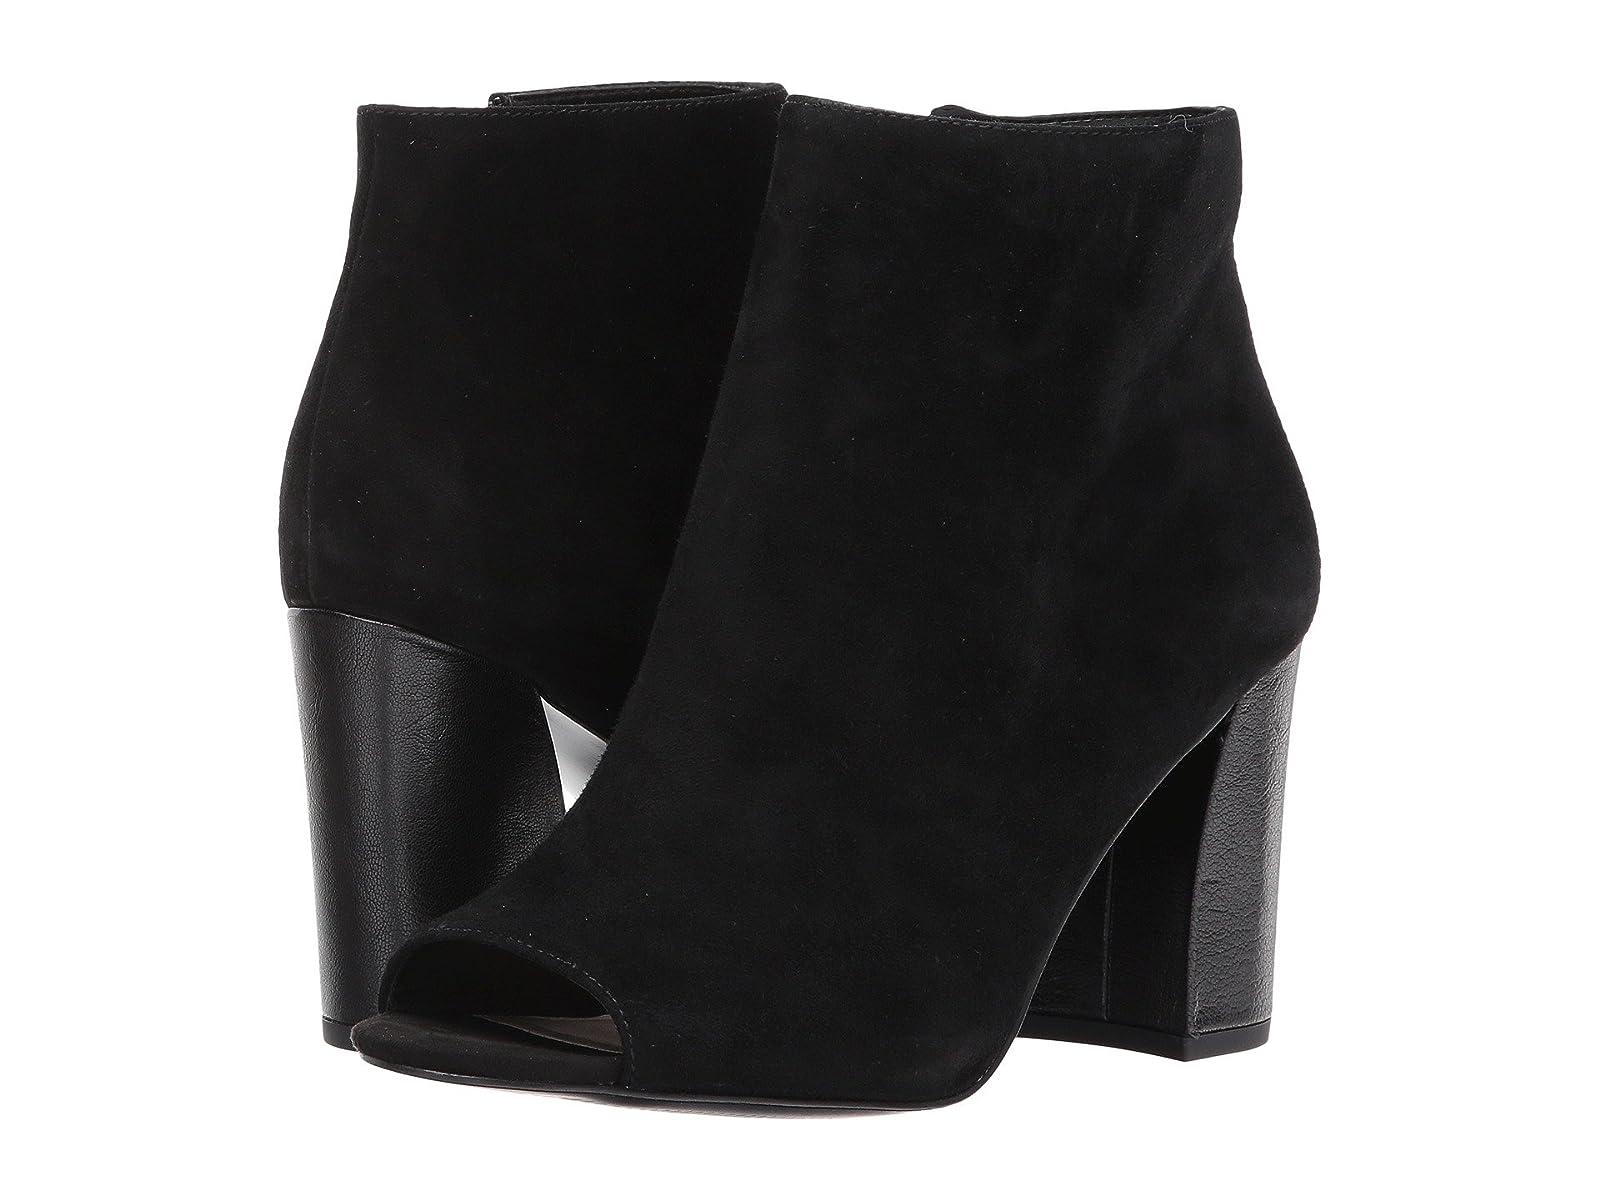 Nine West HaywoodCheap and distinctive eye-catching shoes